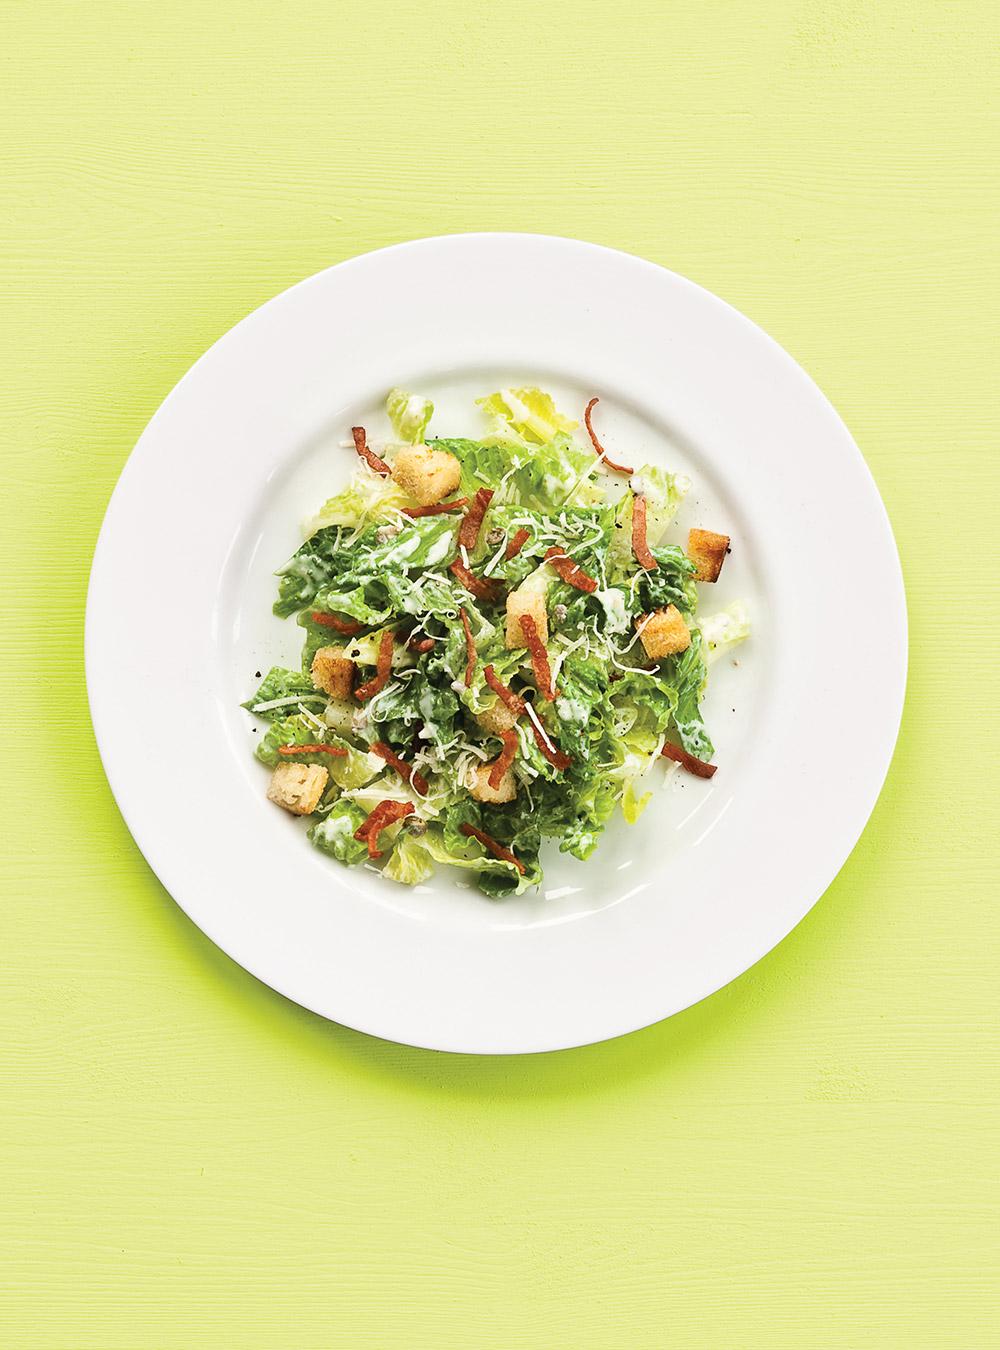 Salade césar légère | ricardo